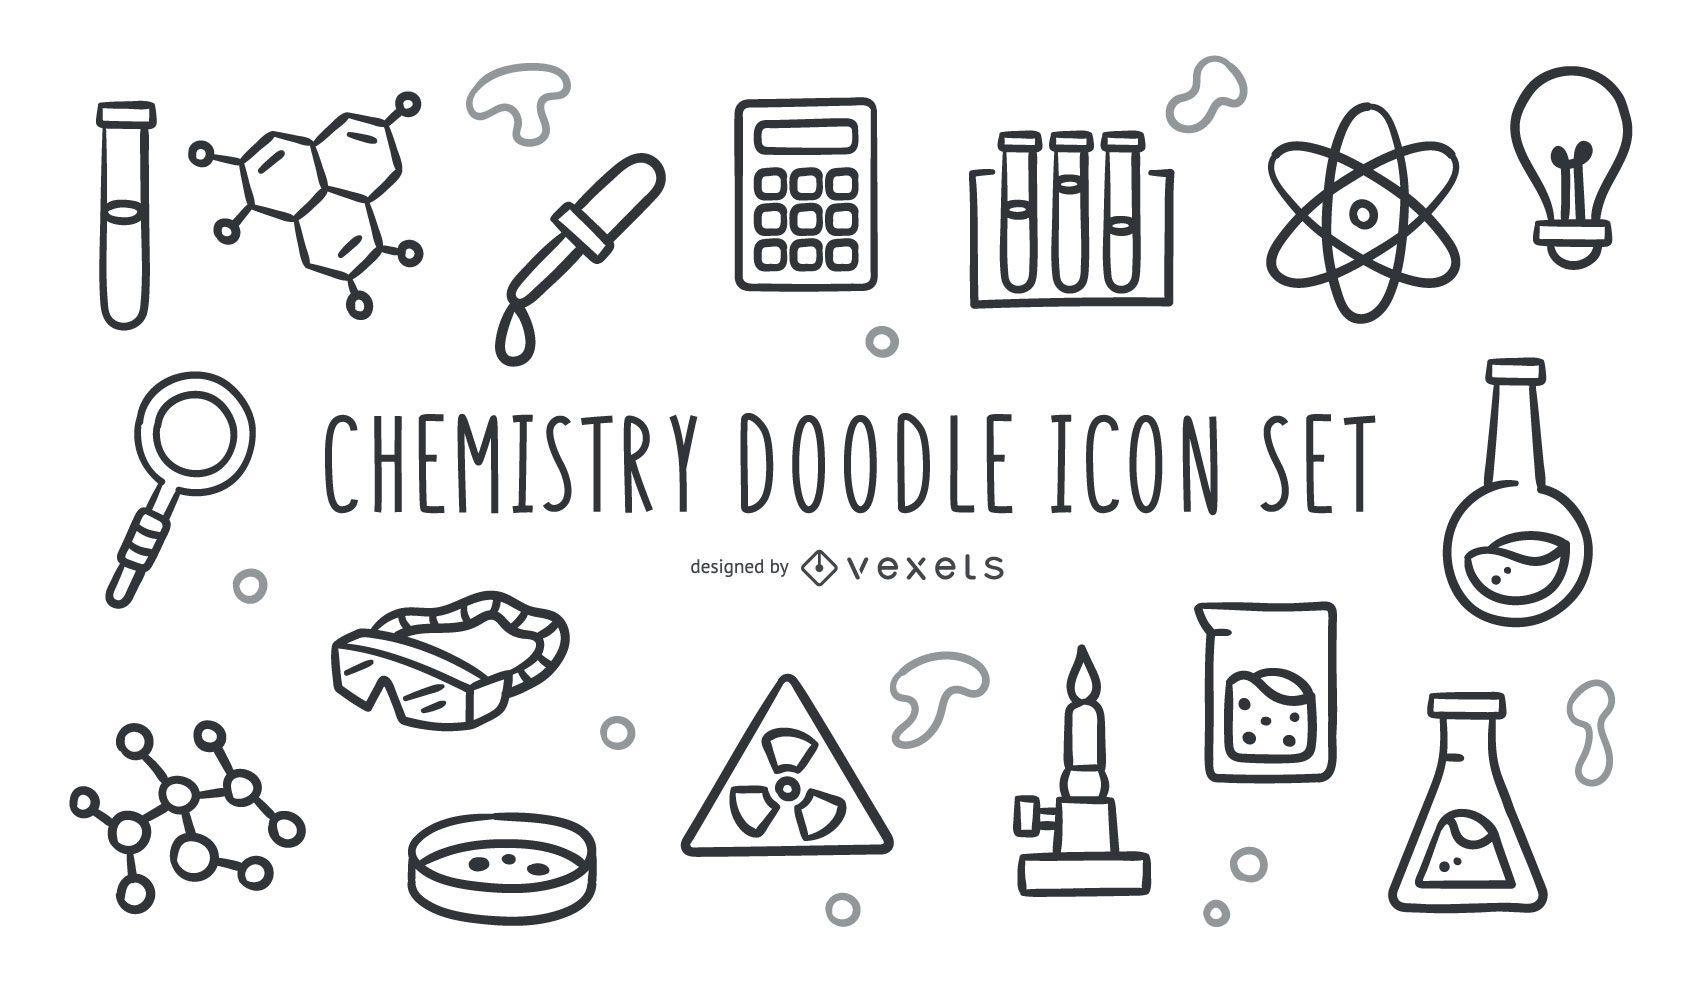 Chemie-Doodle-Symbolsatz